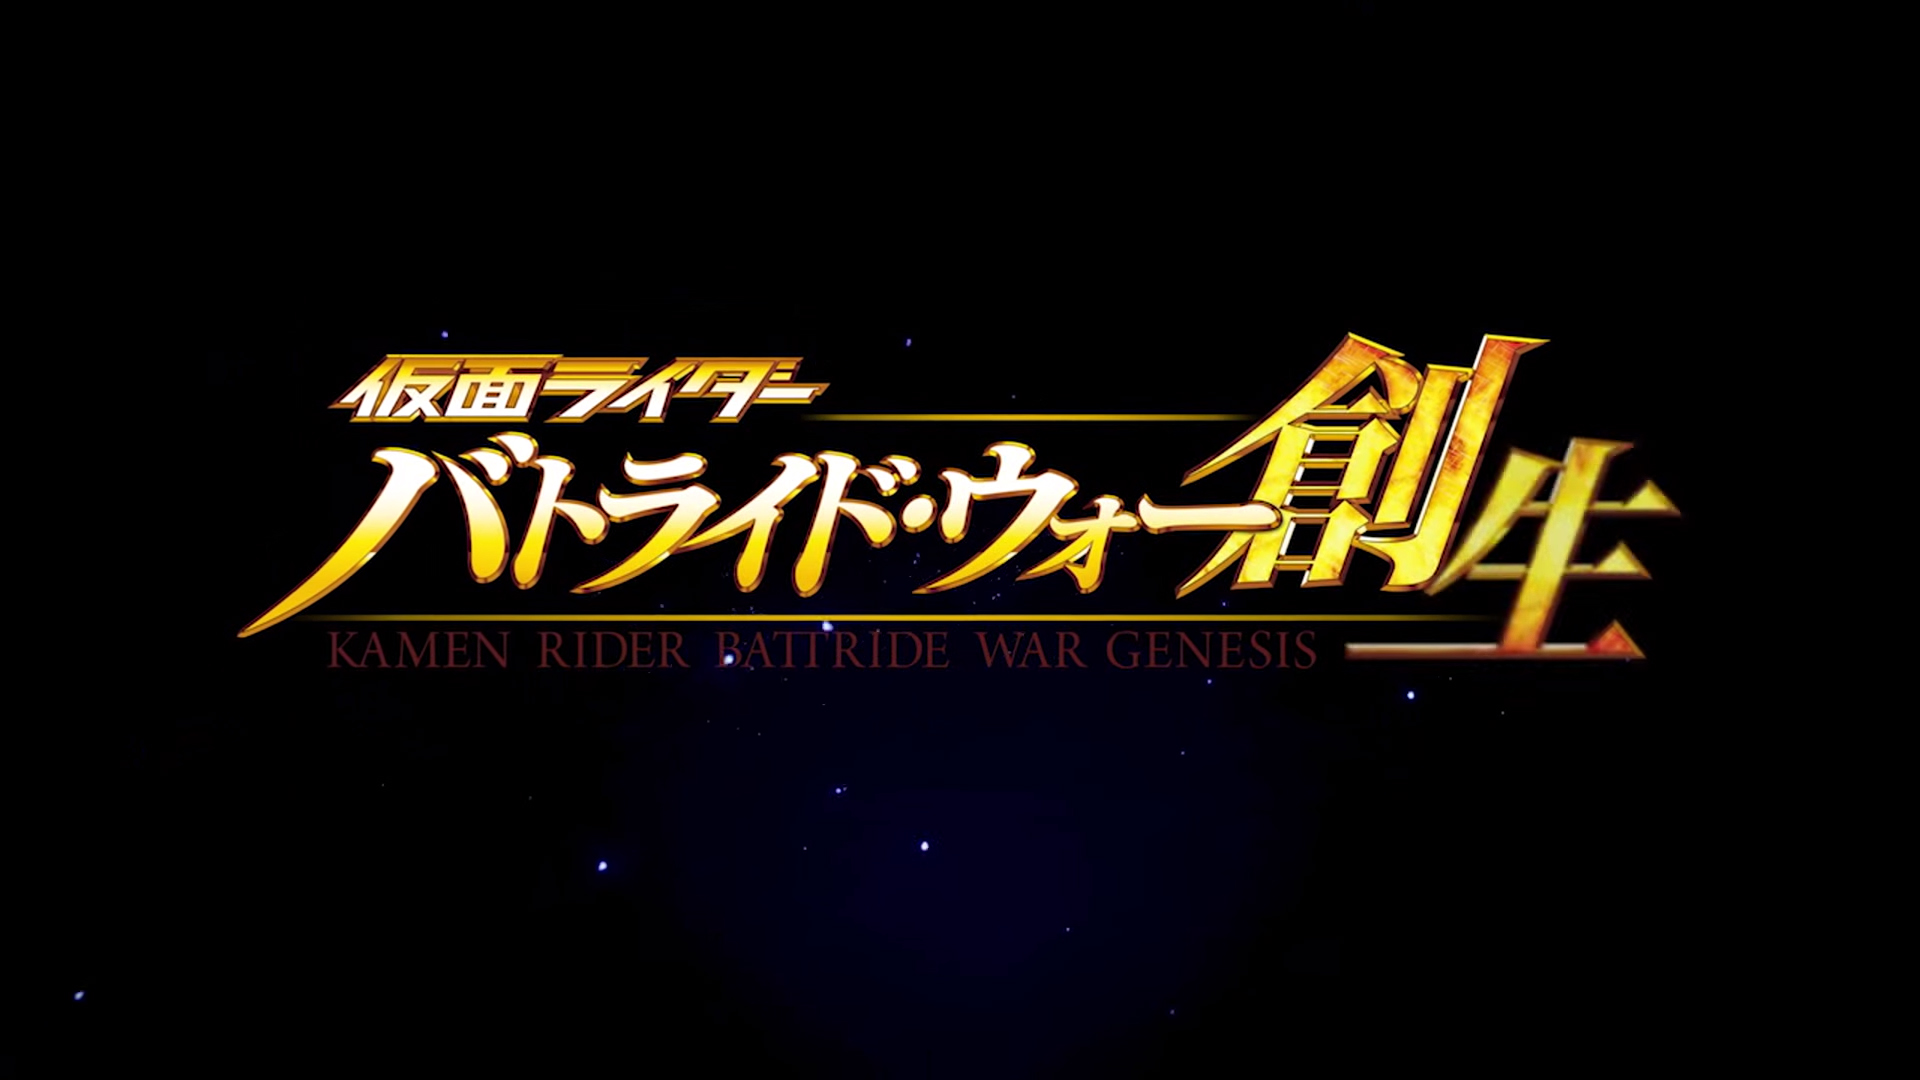 Trailer for Kamen Rider: Battride War Genesis Released